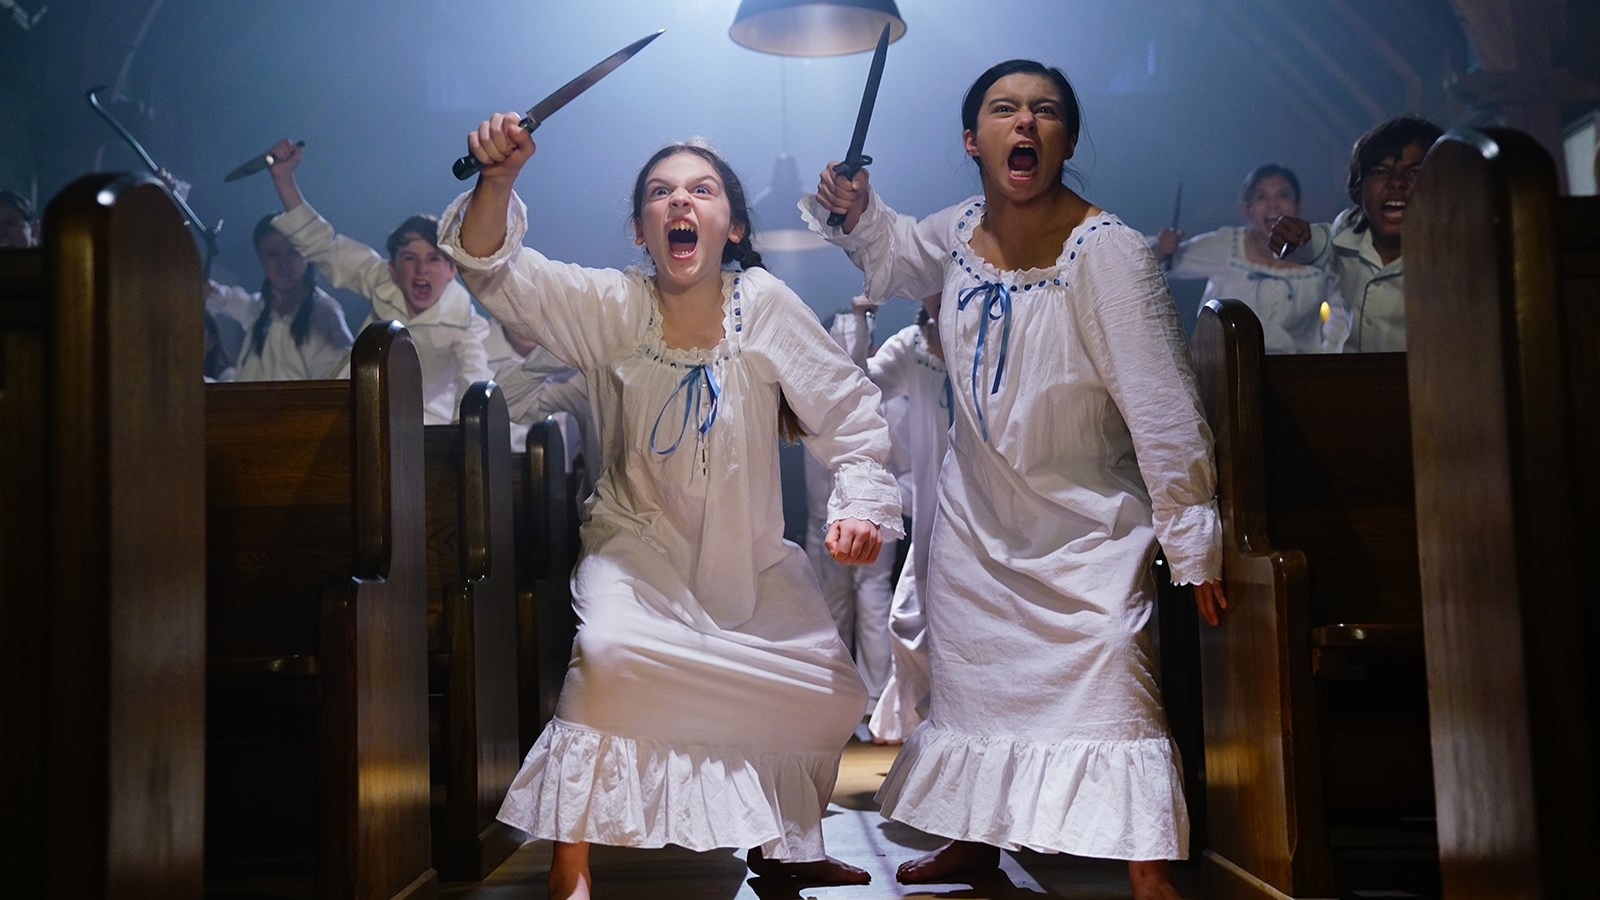 American Nightmare 2002 nightmare cinema